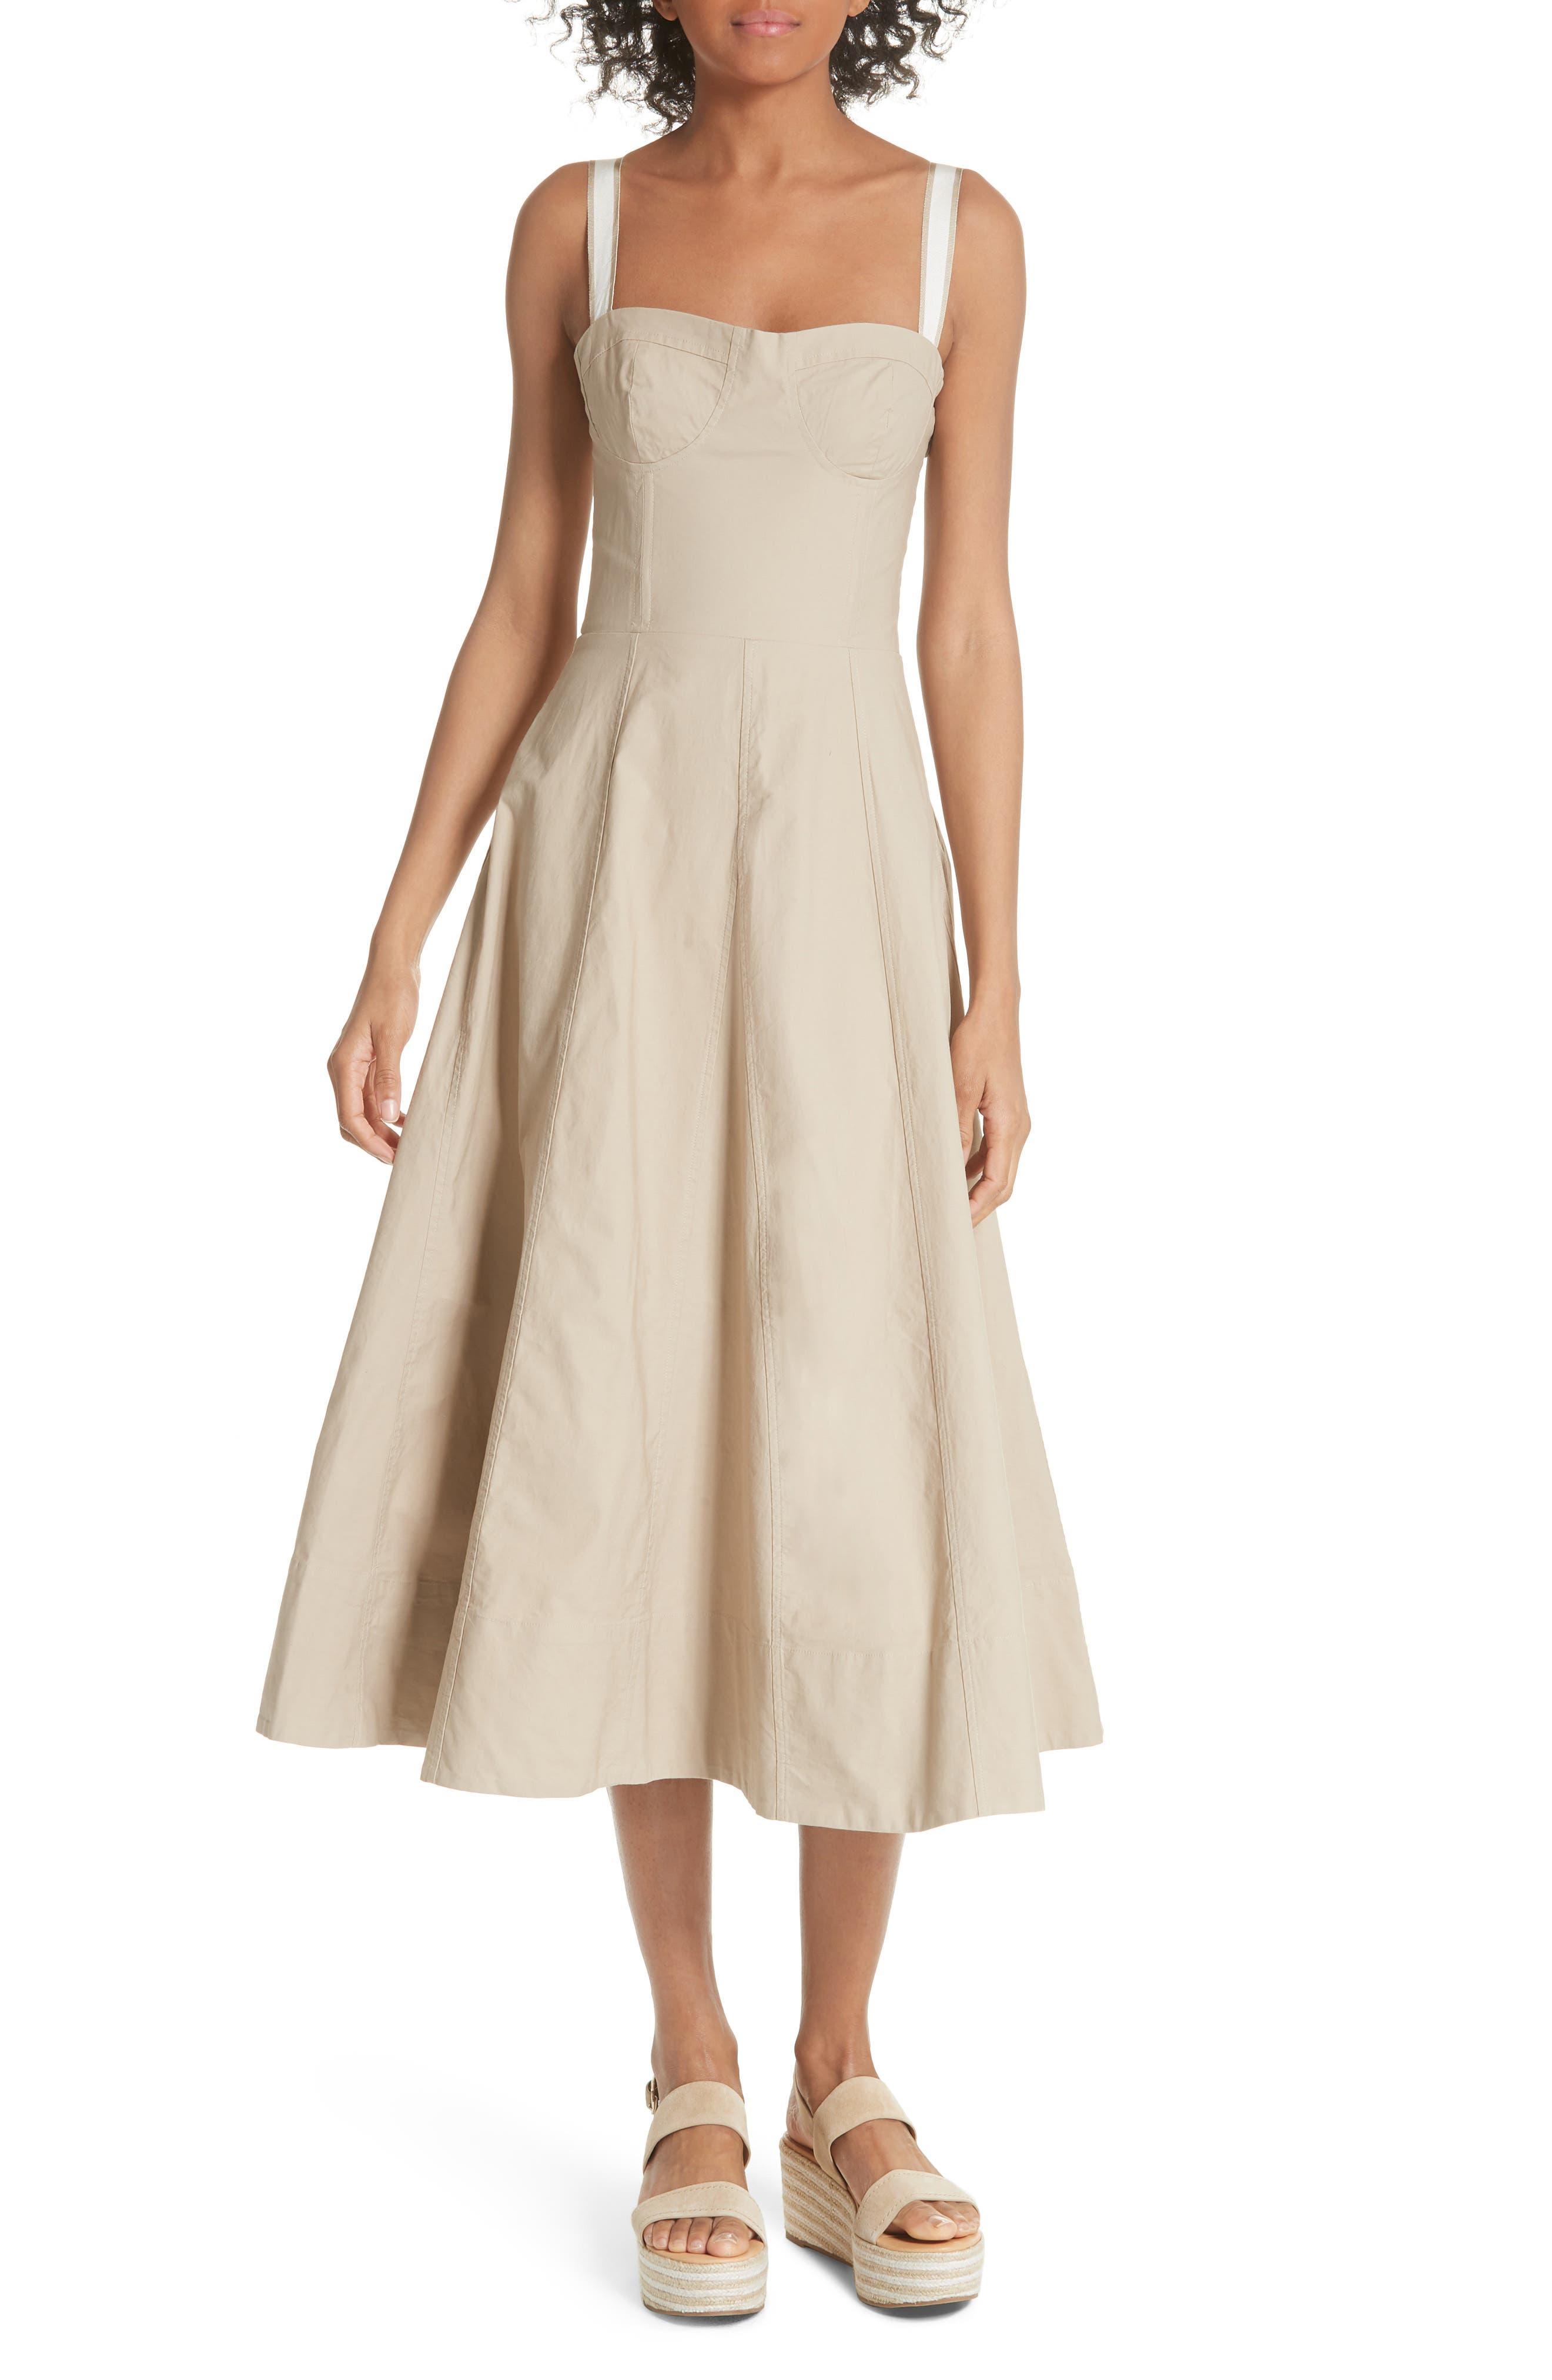 Briel Midi Dress,                         Main,                         color, 253